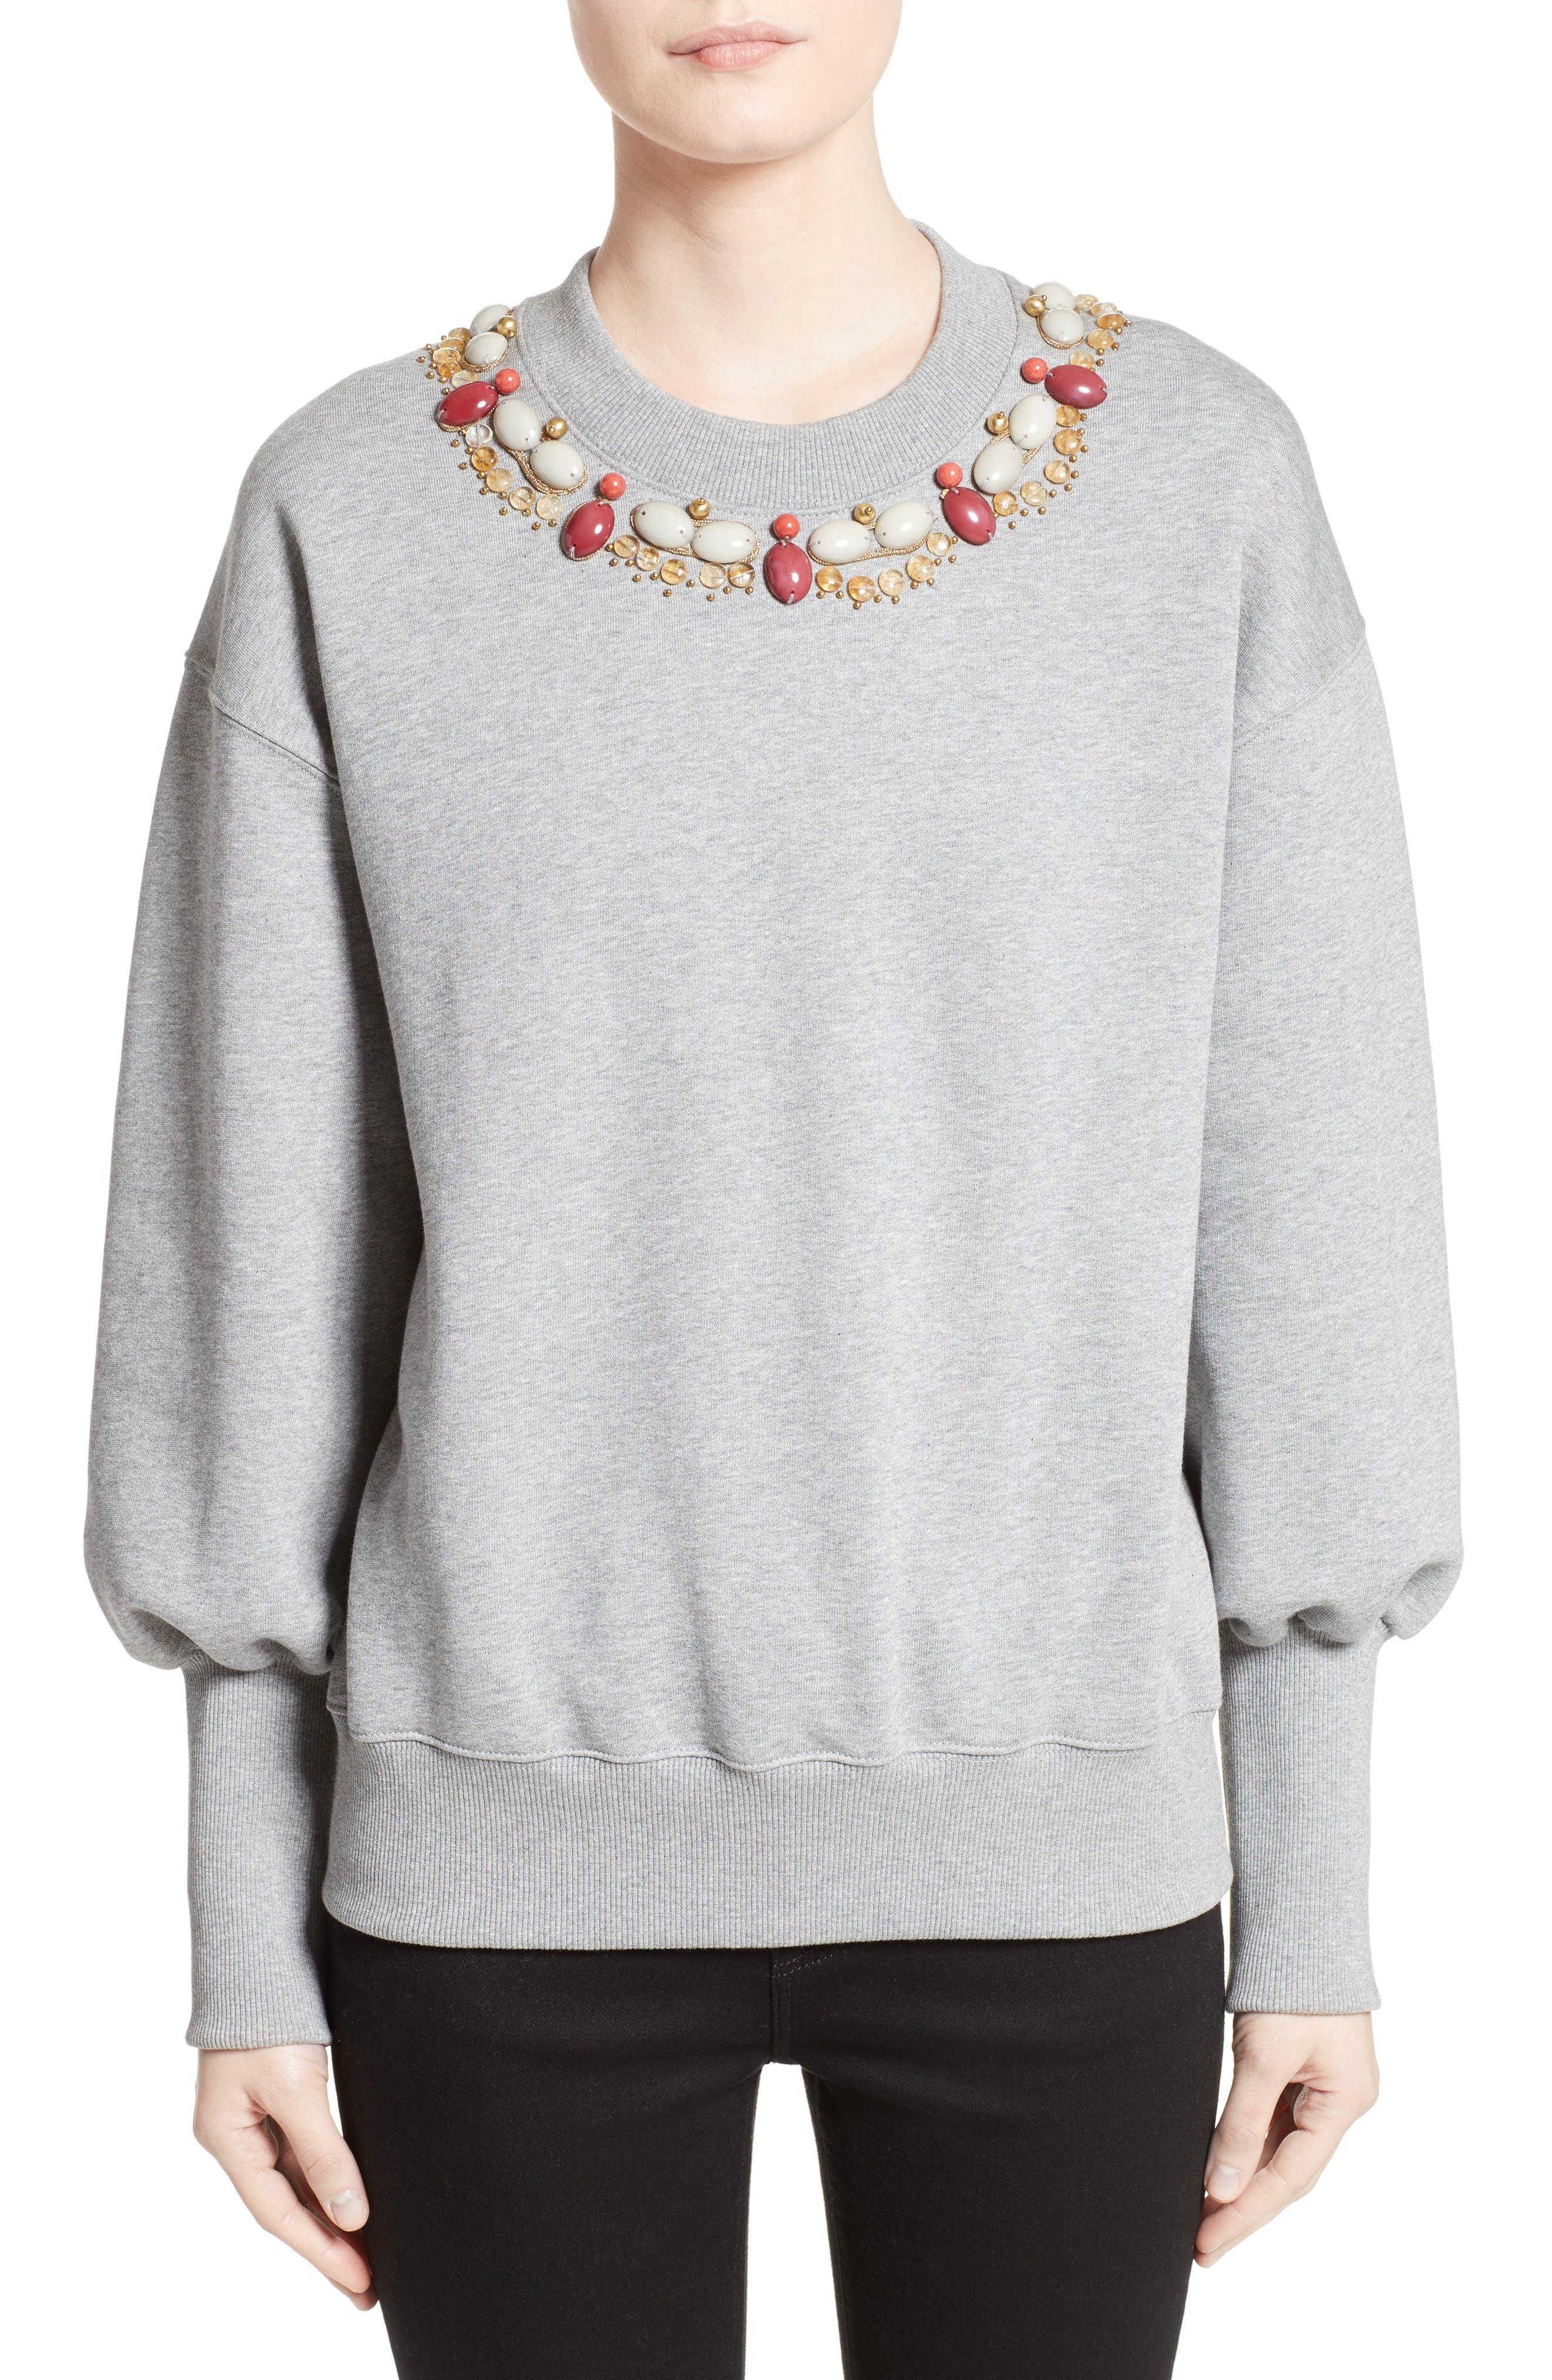 Juliano Embellished Sweatshirt,                             Main thumbnail 1, color,                             050